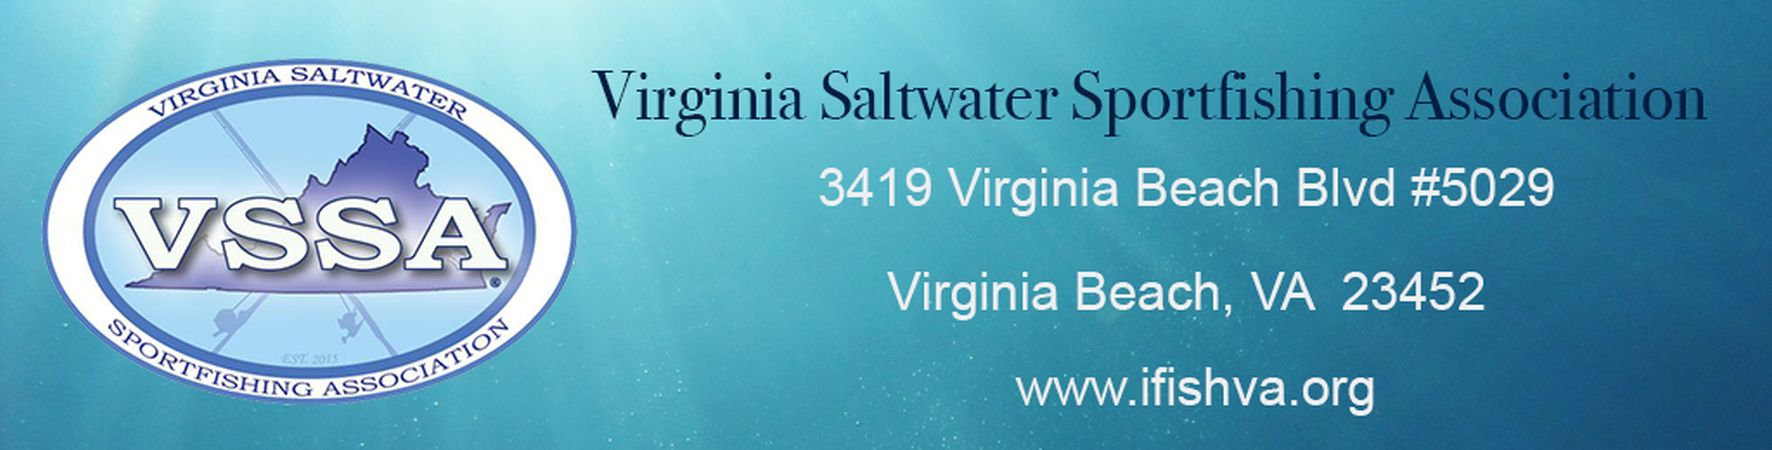 Virginia Saltwater Sportfishing Association